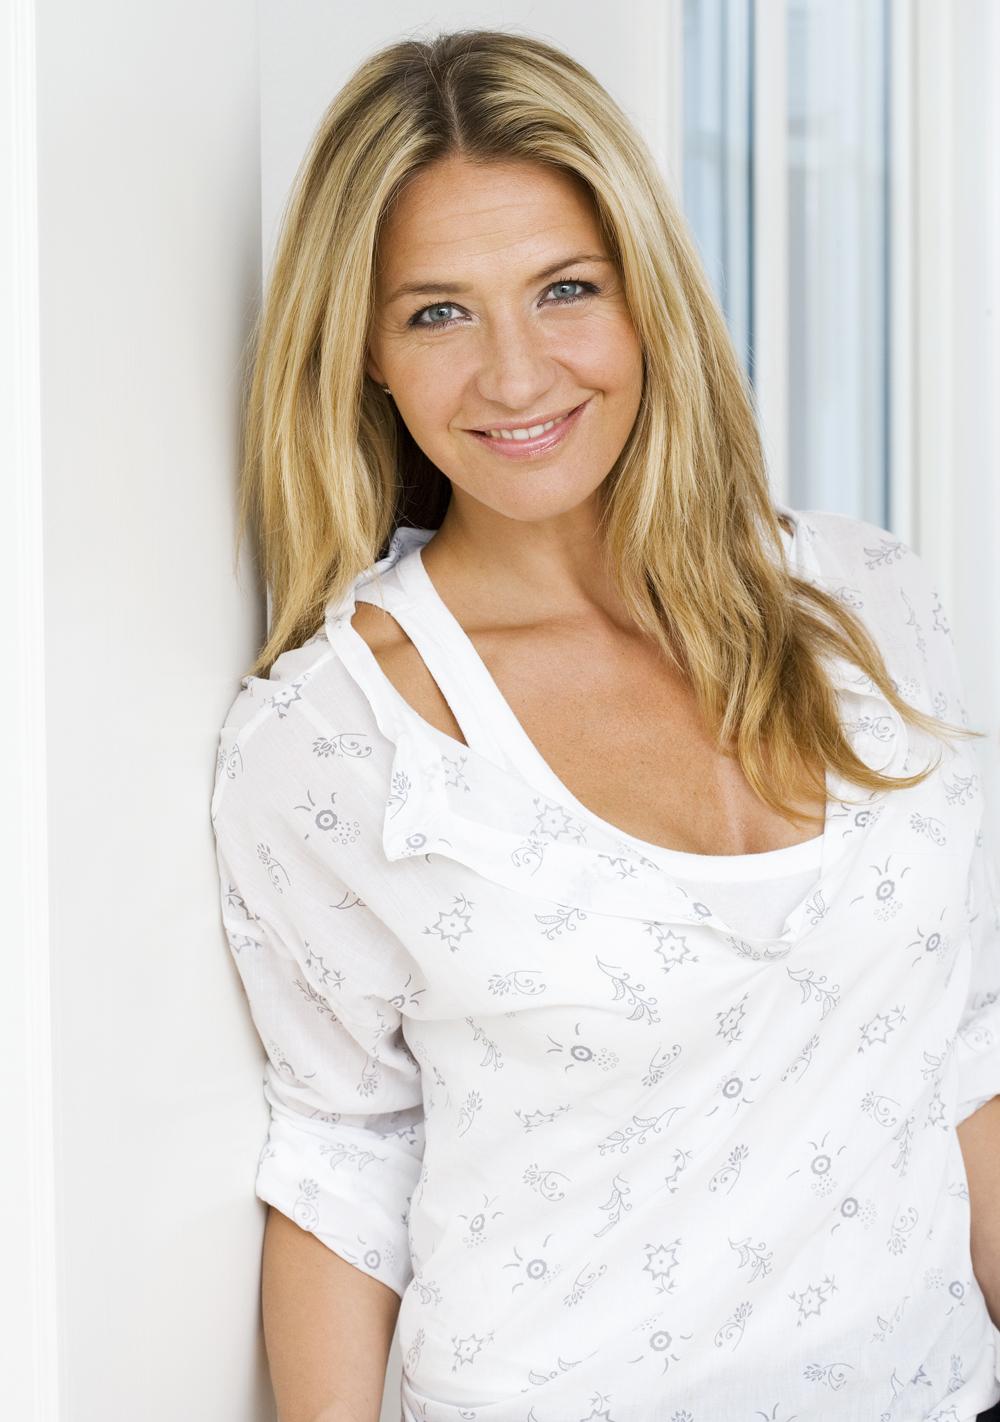 Kristin Kaspersen Net Worth